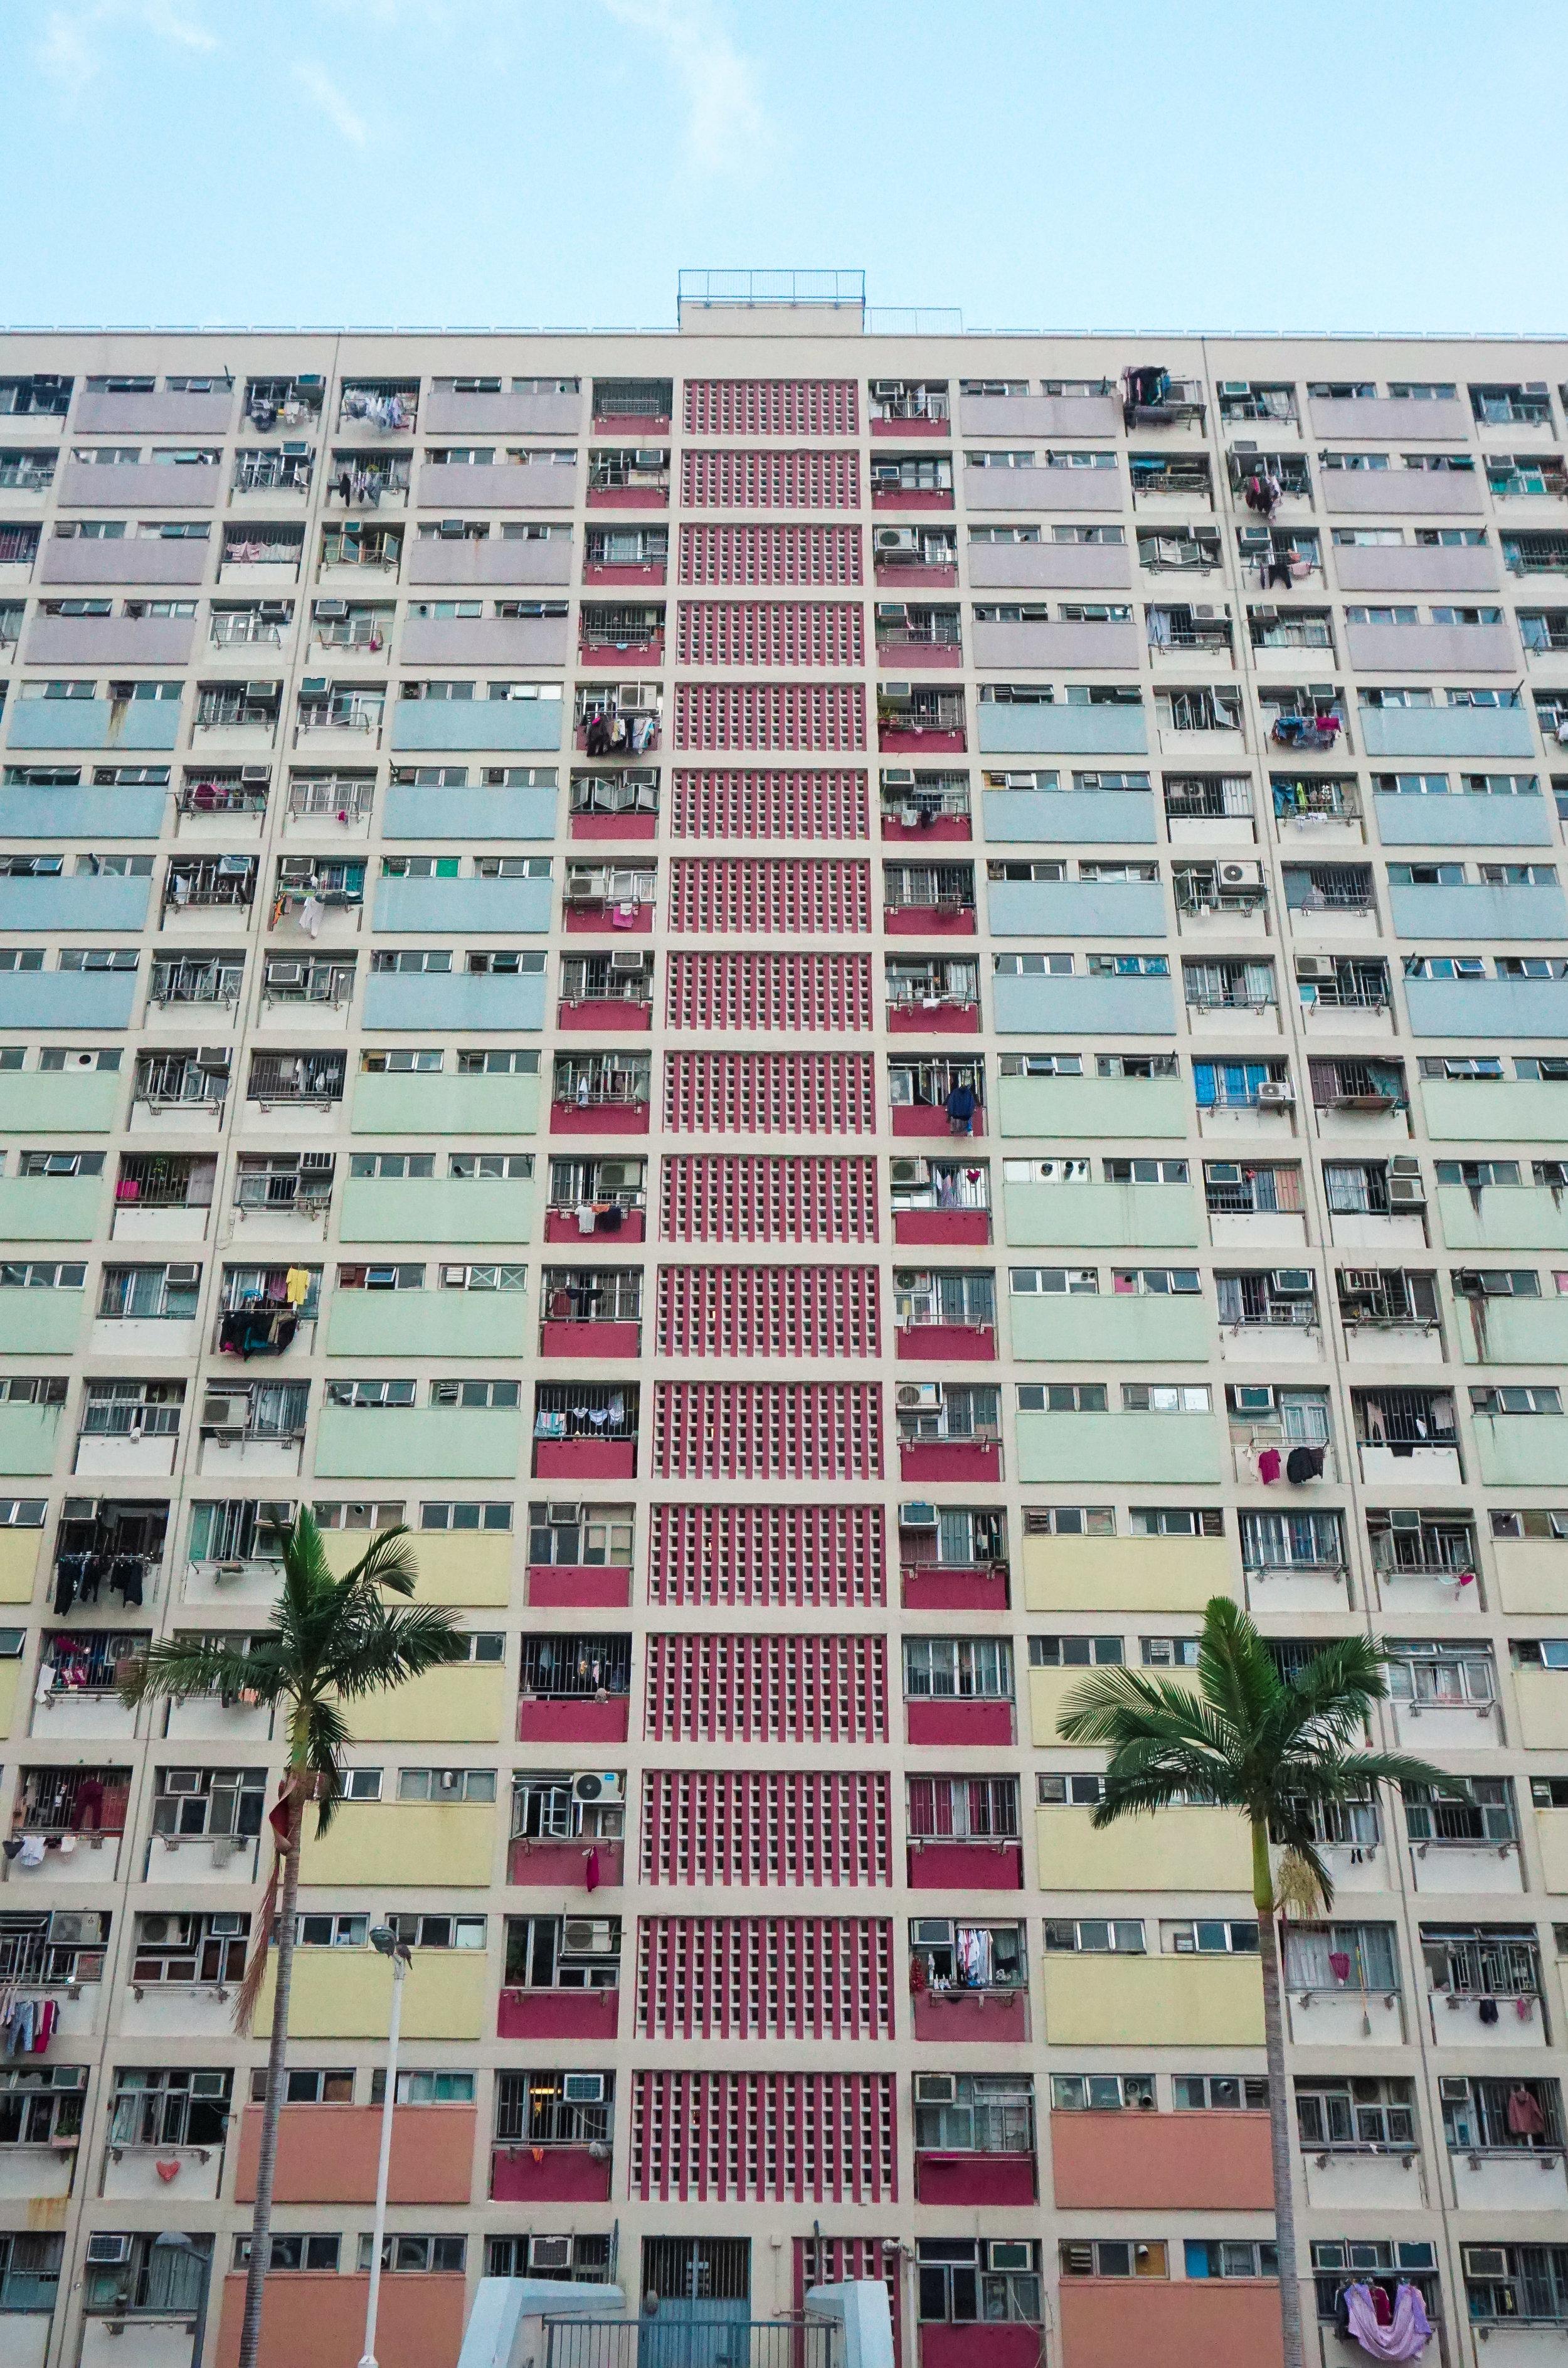 curio.trips.hong.kong.colourful.basketball.building.palm.trees.portrait-2.jpg